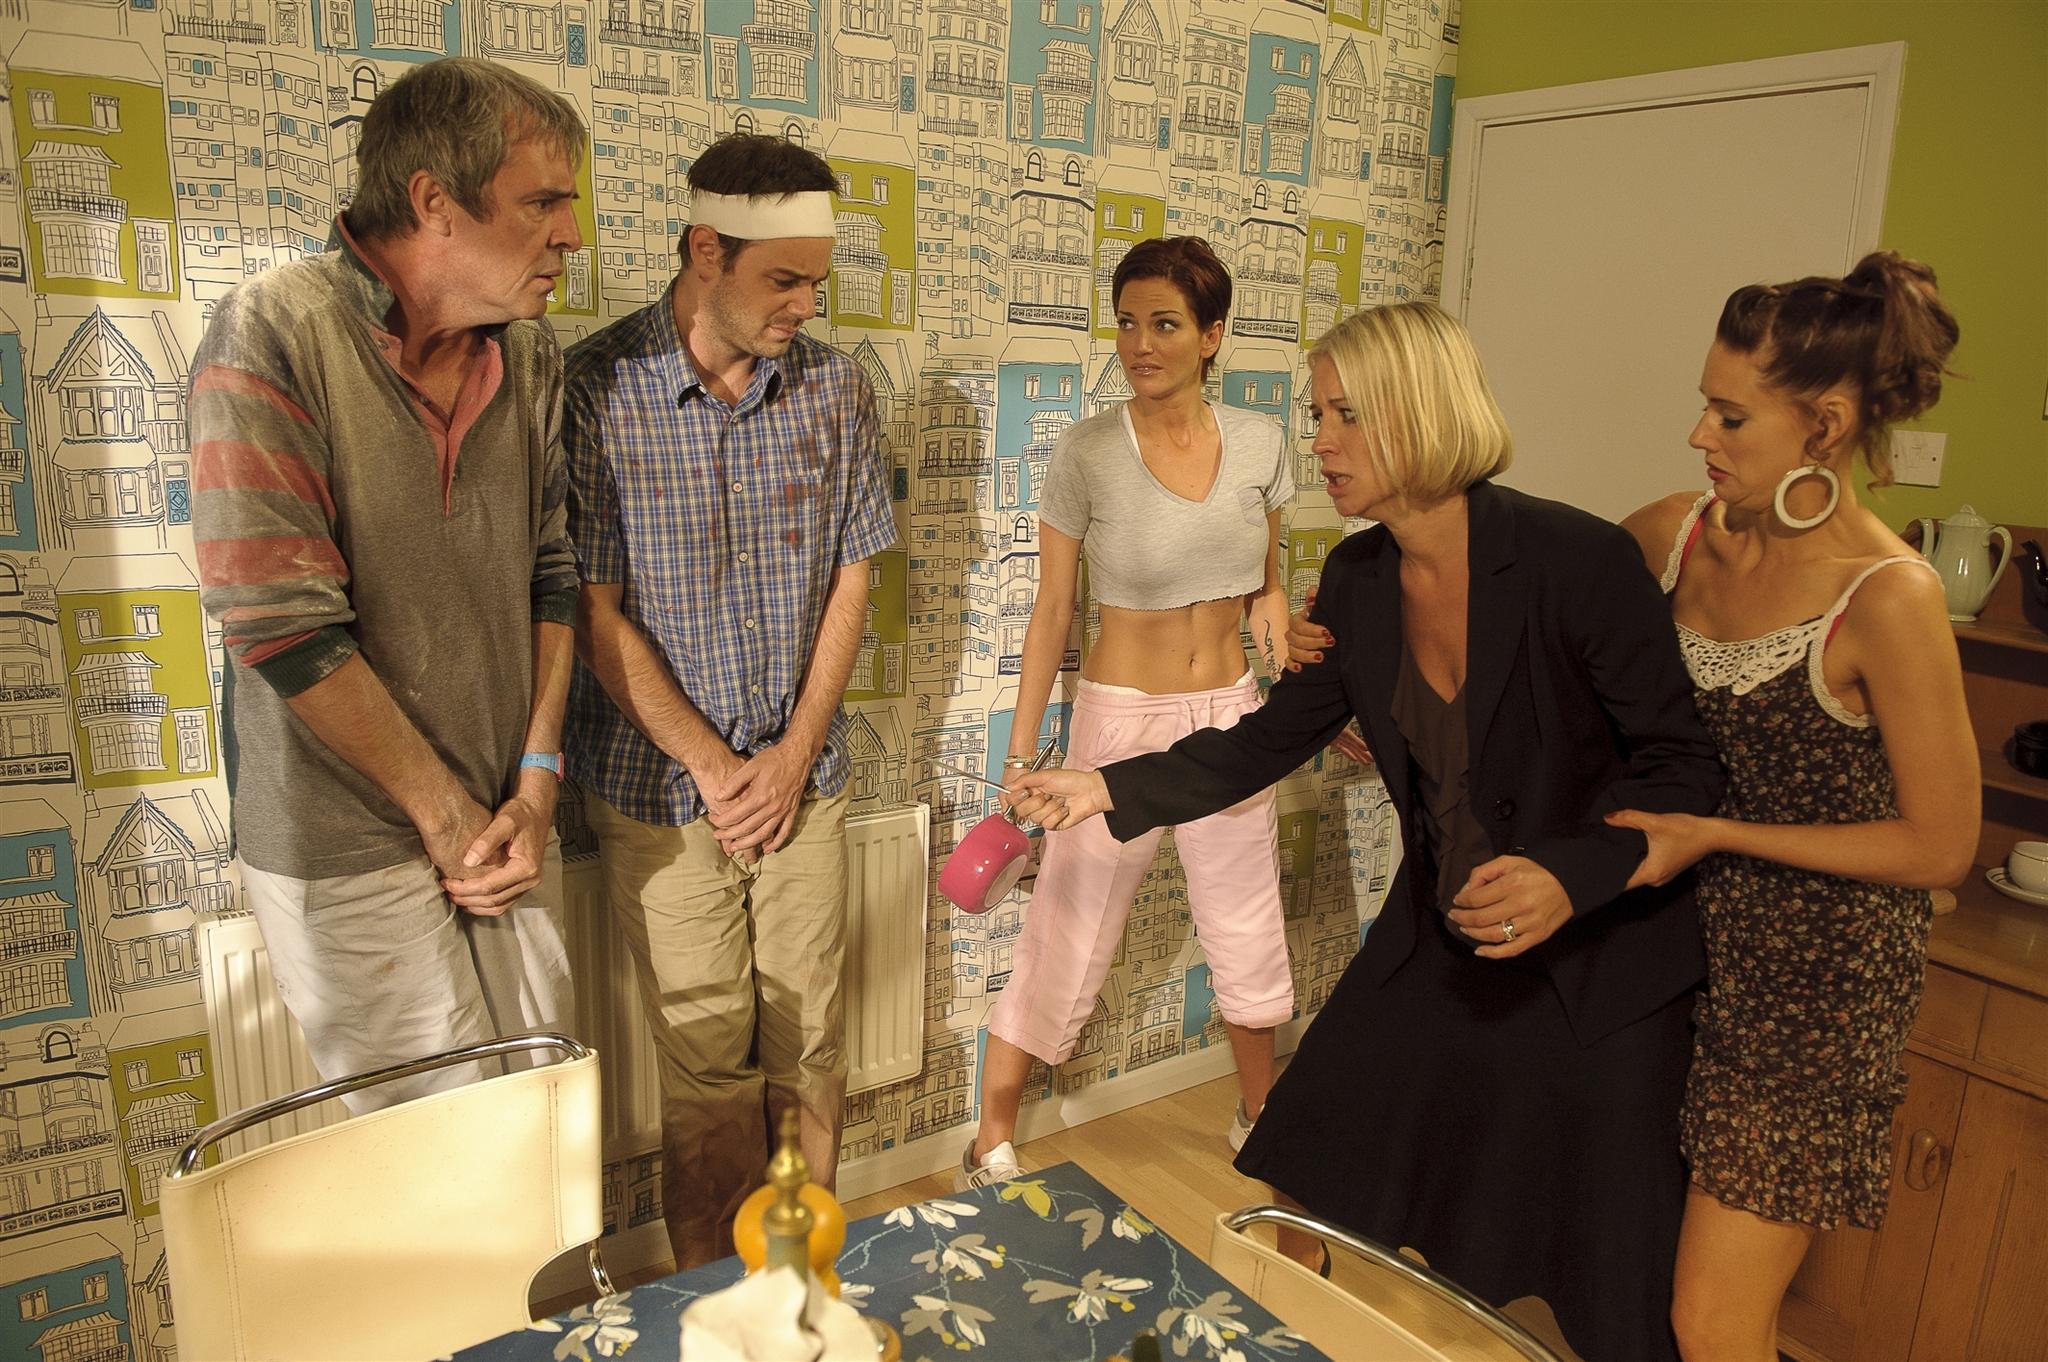 Danny Dyer, Neil Morrissey, Denise Van Outen, Kellie Shirley, and Sarah Harding in Run for Your Wife (2012)